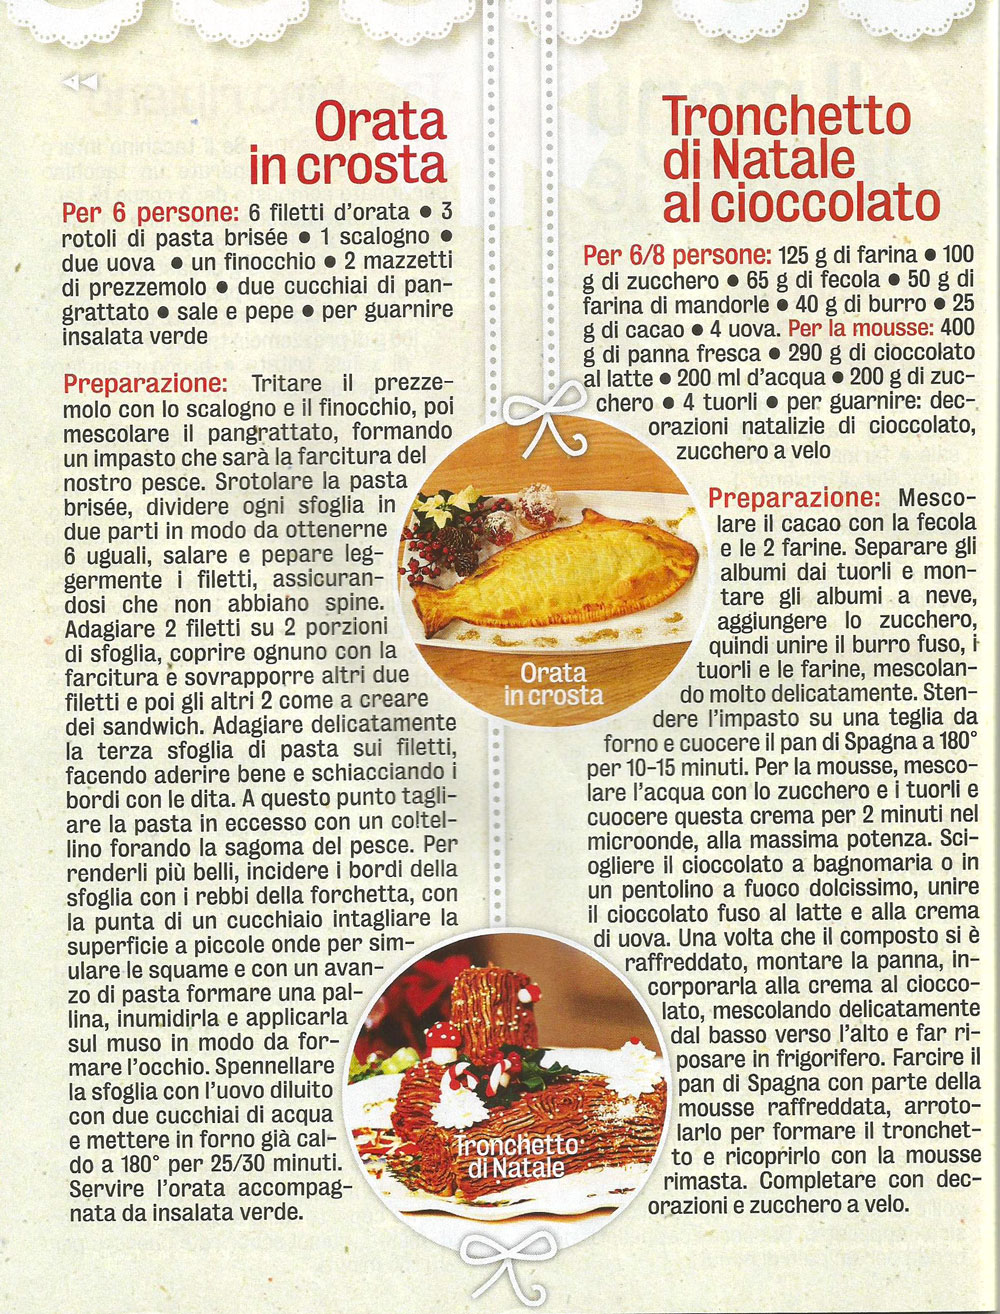 Tronchetto Di Natale Parodi.Diva E Donna Parodi 5 Lorenzo Boni Chef